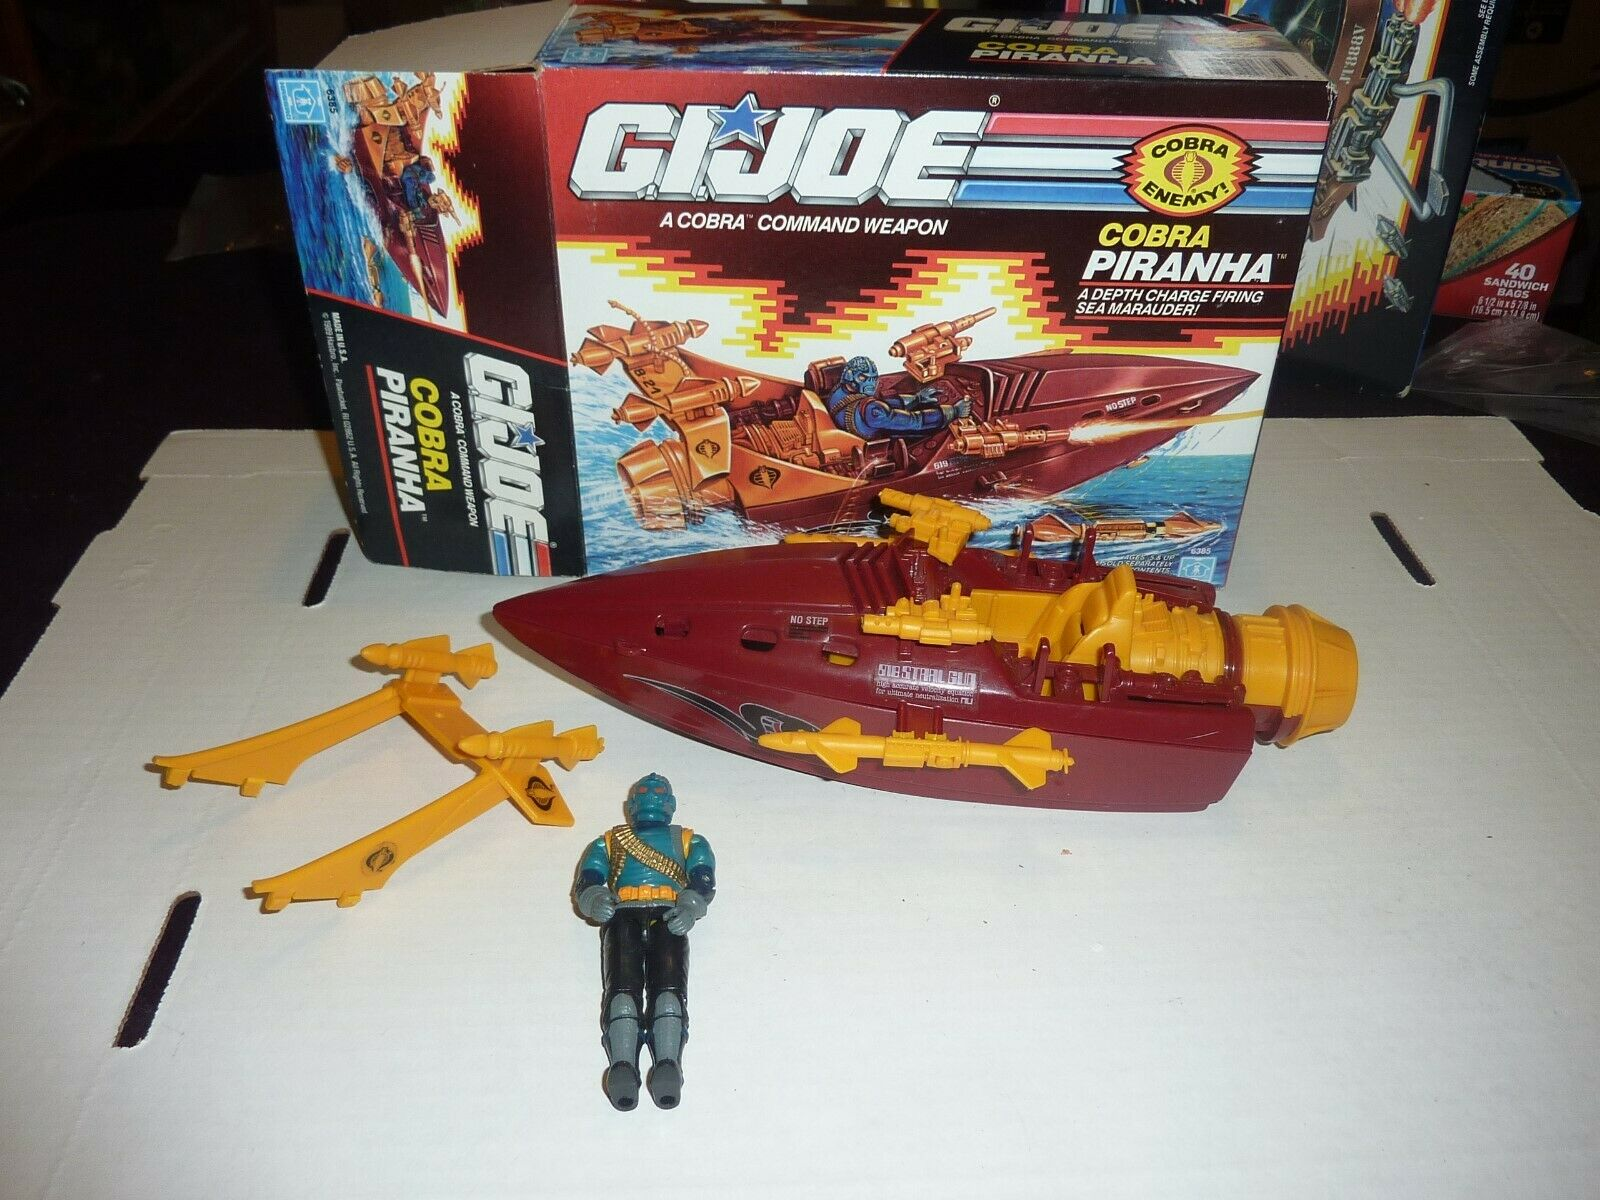 Vintage G.I. Joe Cobra Piranha Sea  Marauder Near Complete w Box 1989 Boat Set  jusqu'à 50% de réduction